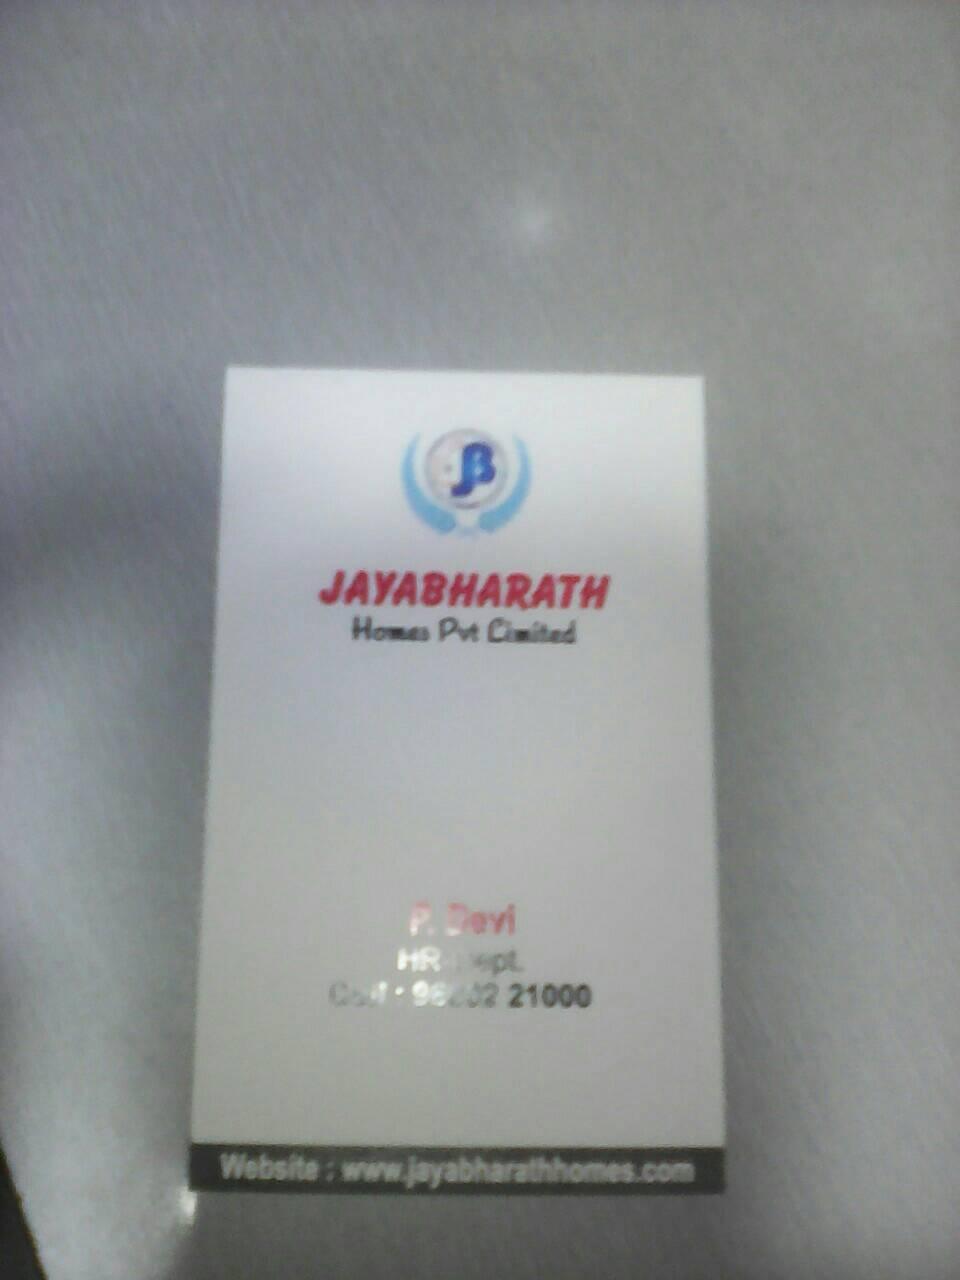 Jaya Bharath Homes Private Limited